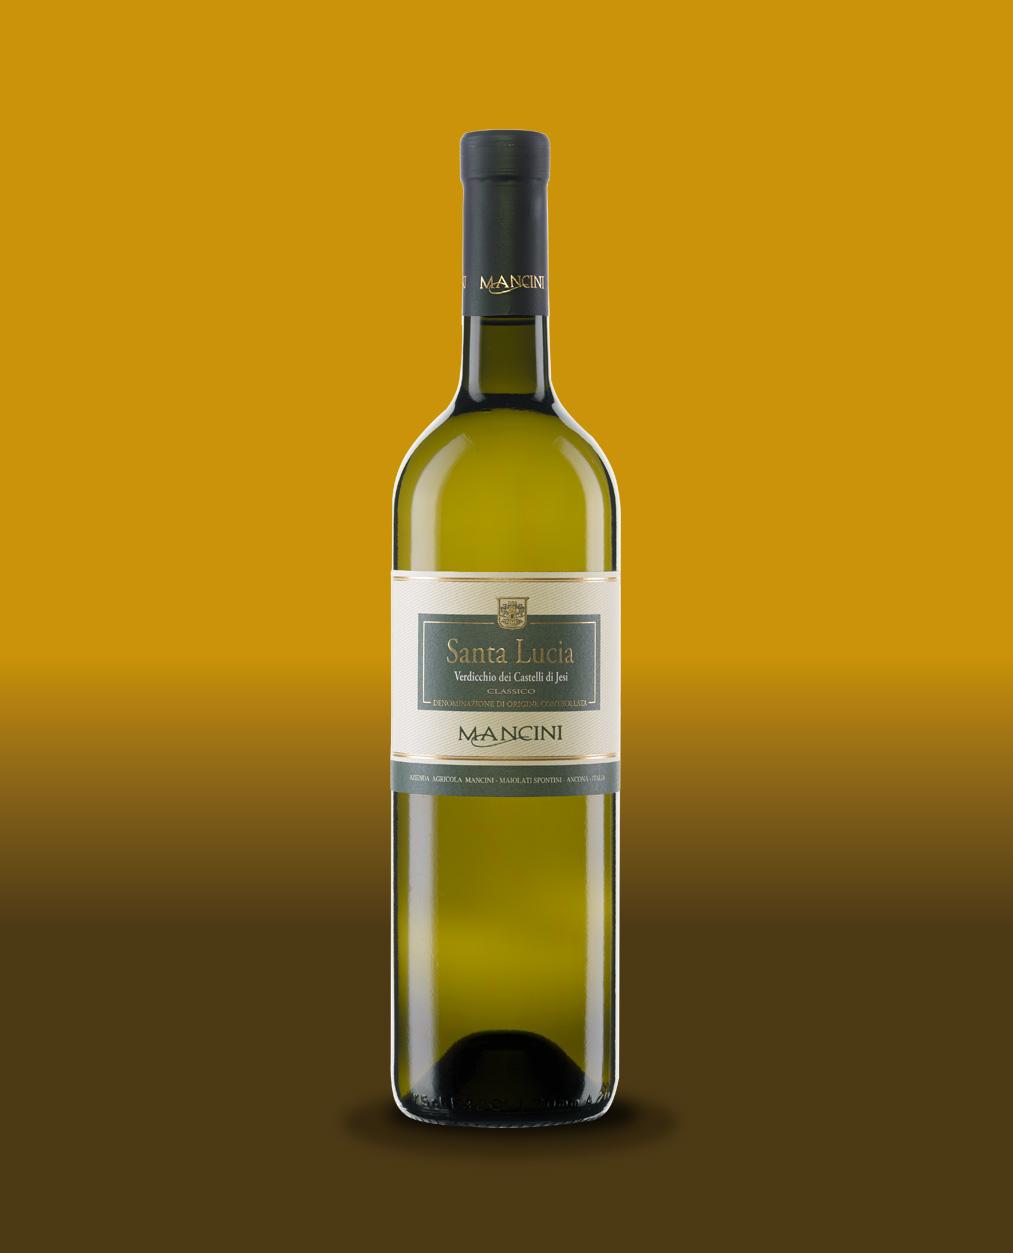 Mancini Vini - Mancini Vini - Moie di Maiolati (An)